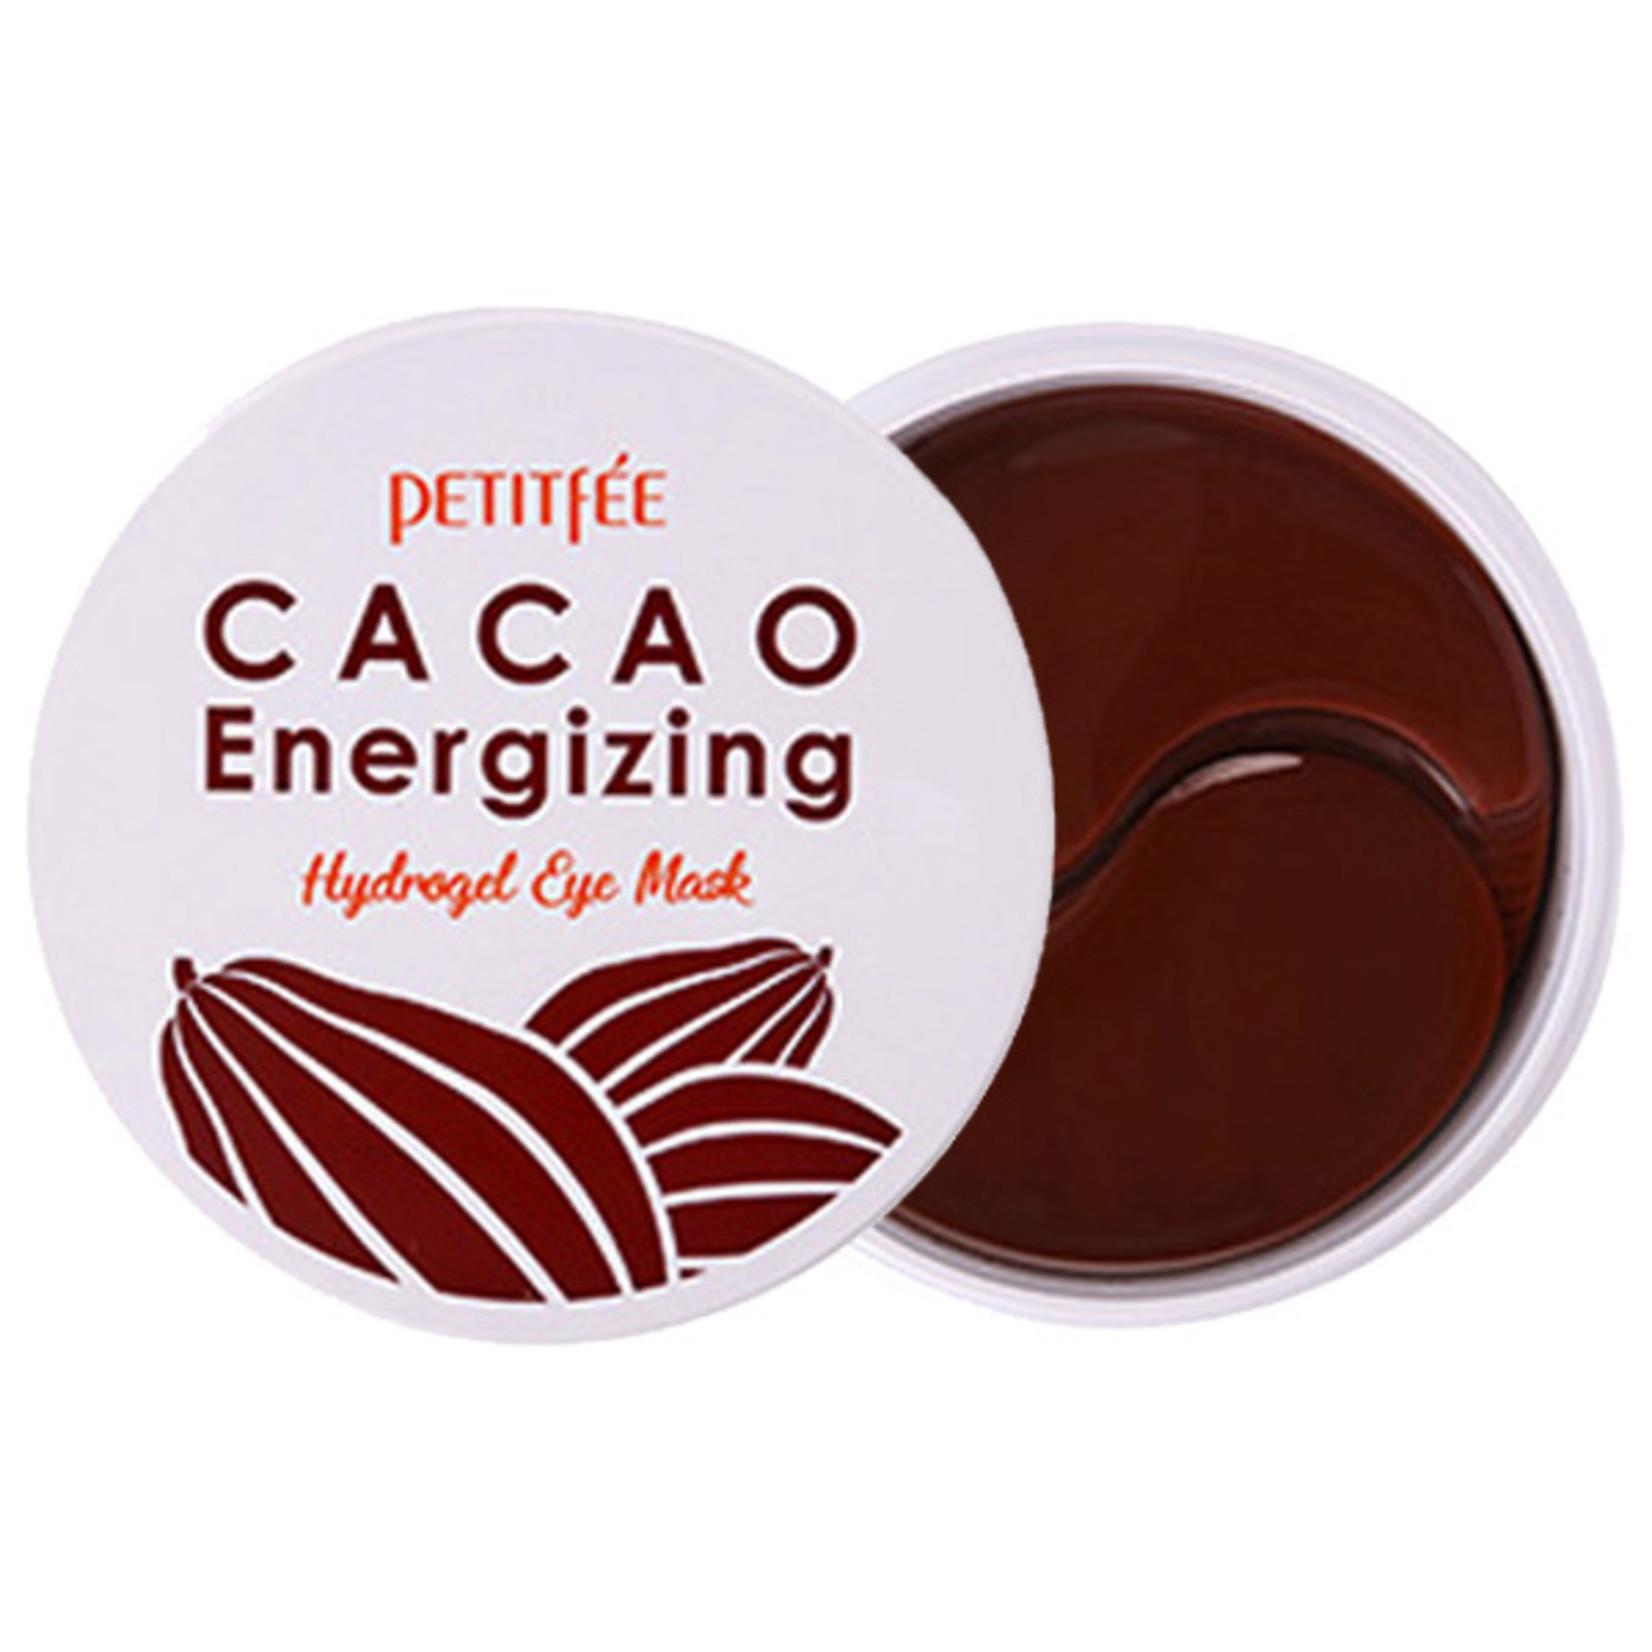 PETITFEE Cacao Energizing Hydrogel Augenpads